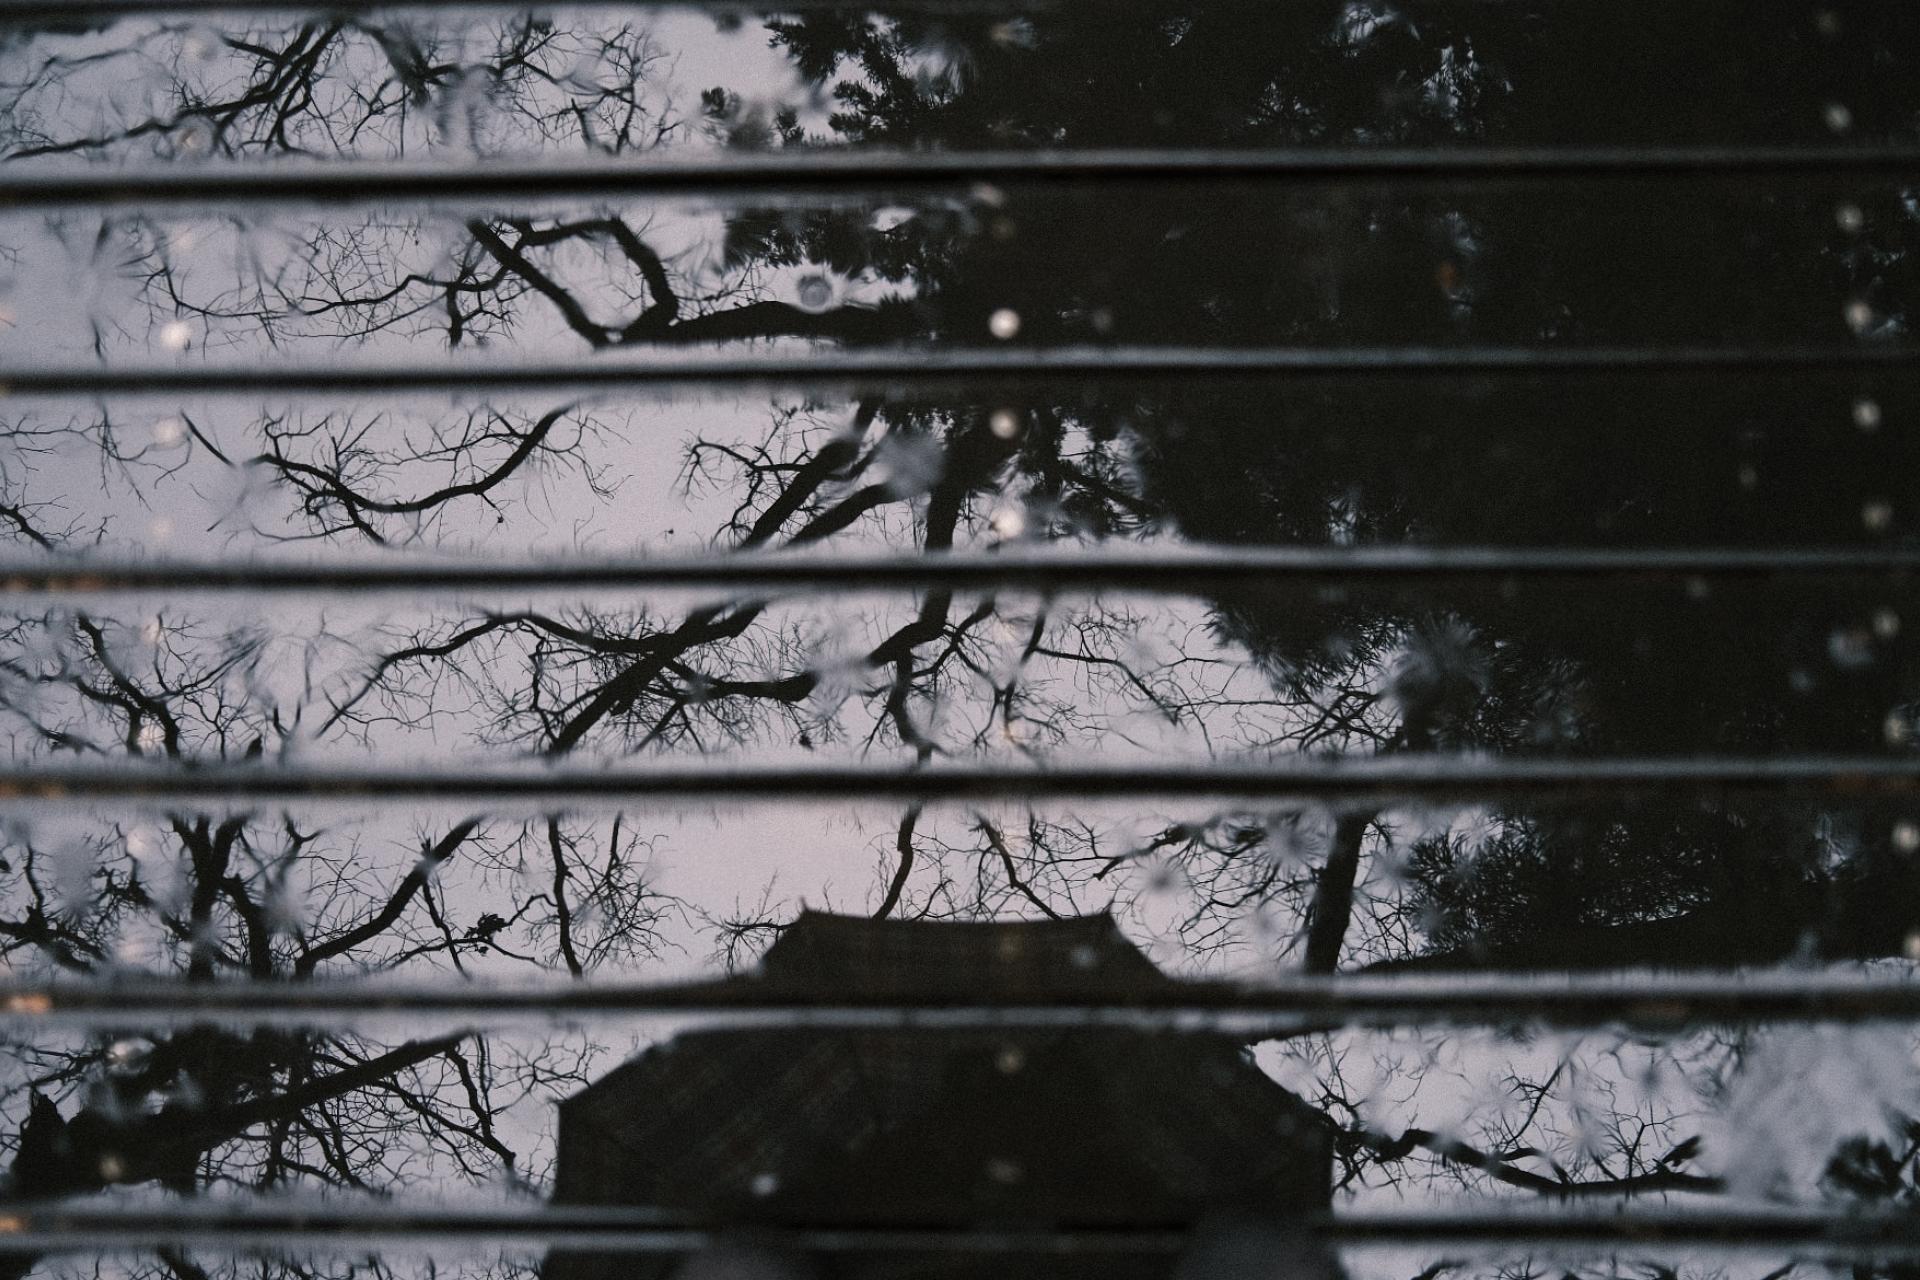 【FUJIFILM】X100Vのクラシックネガのみで雨の日に